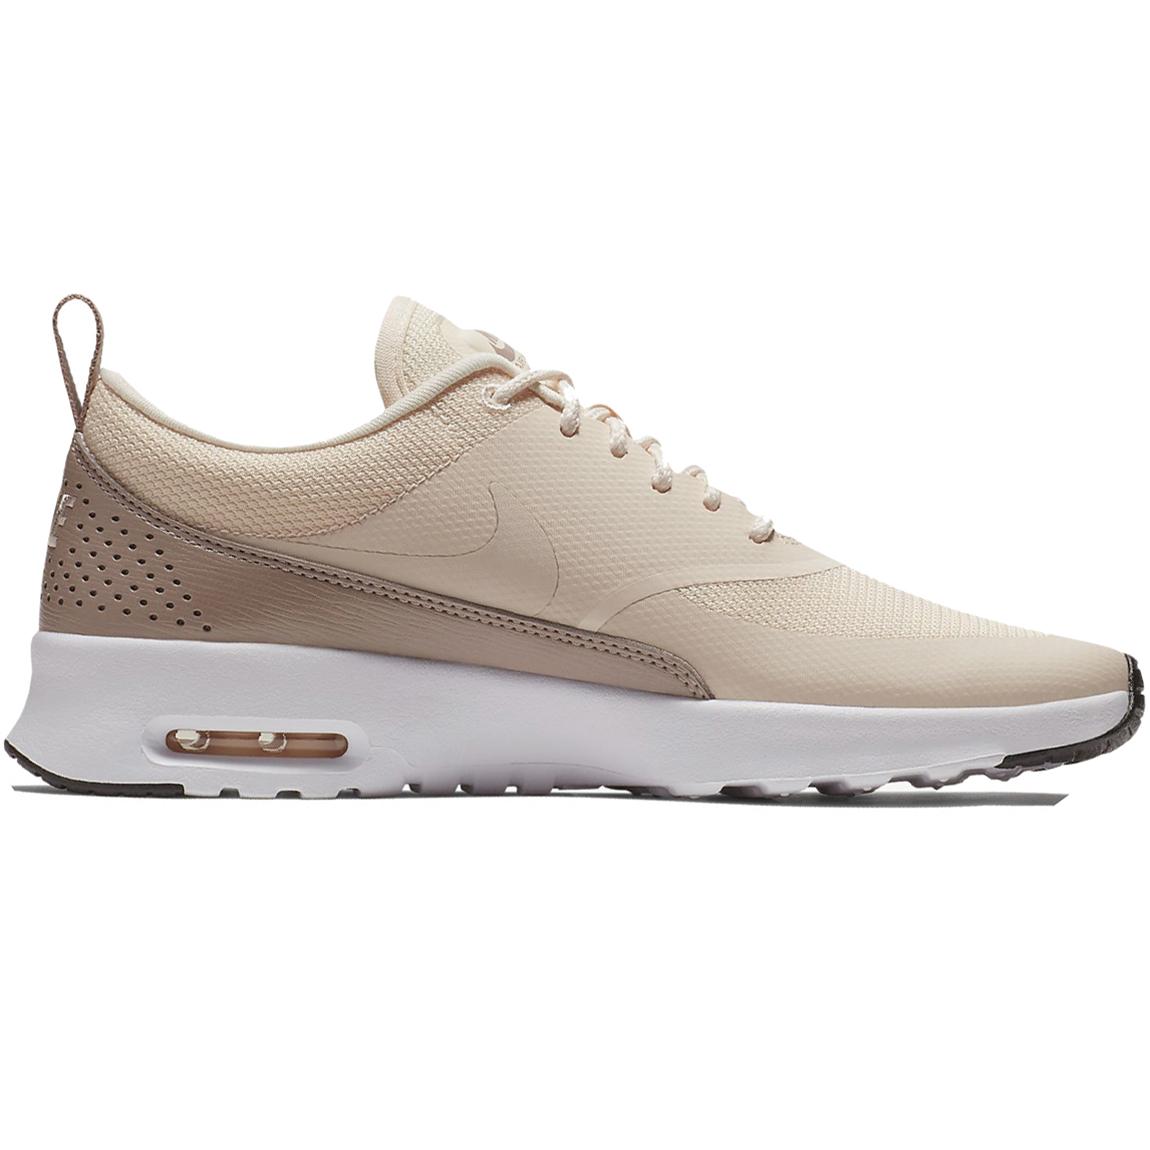 Nike WMNS Air Max Thea Damen Sneaker beige 599409 804